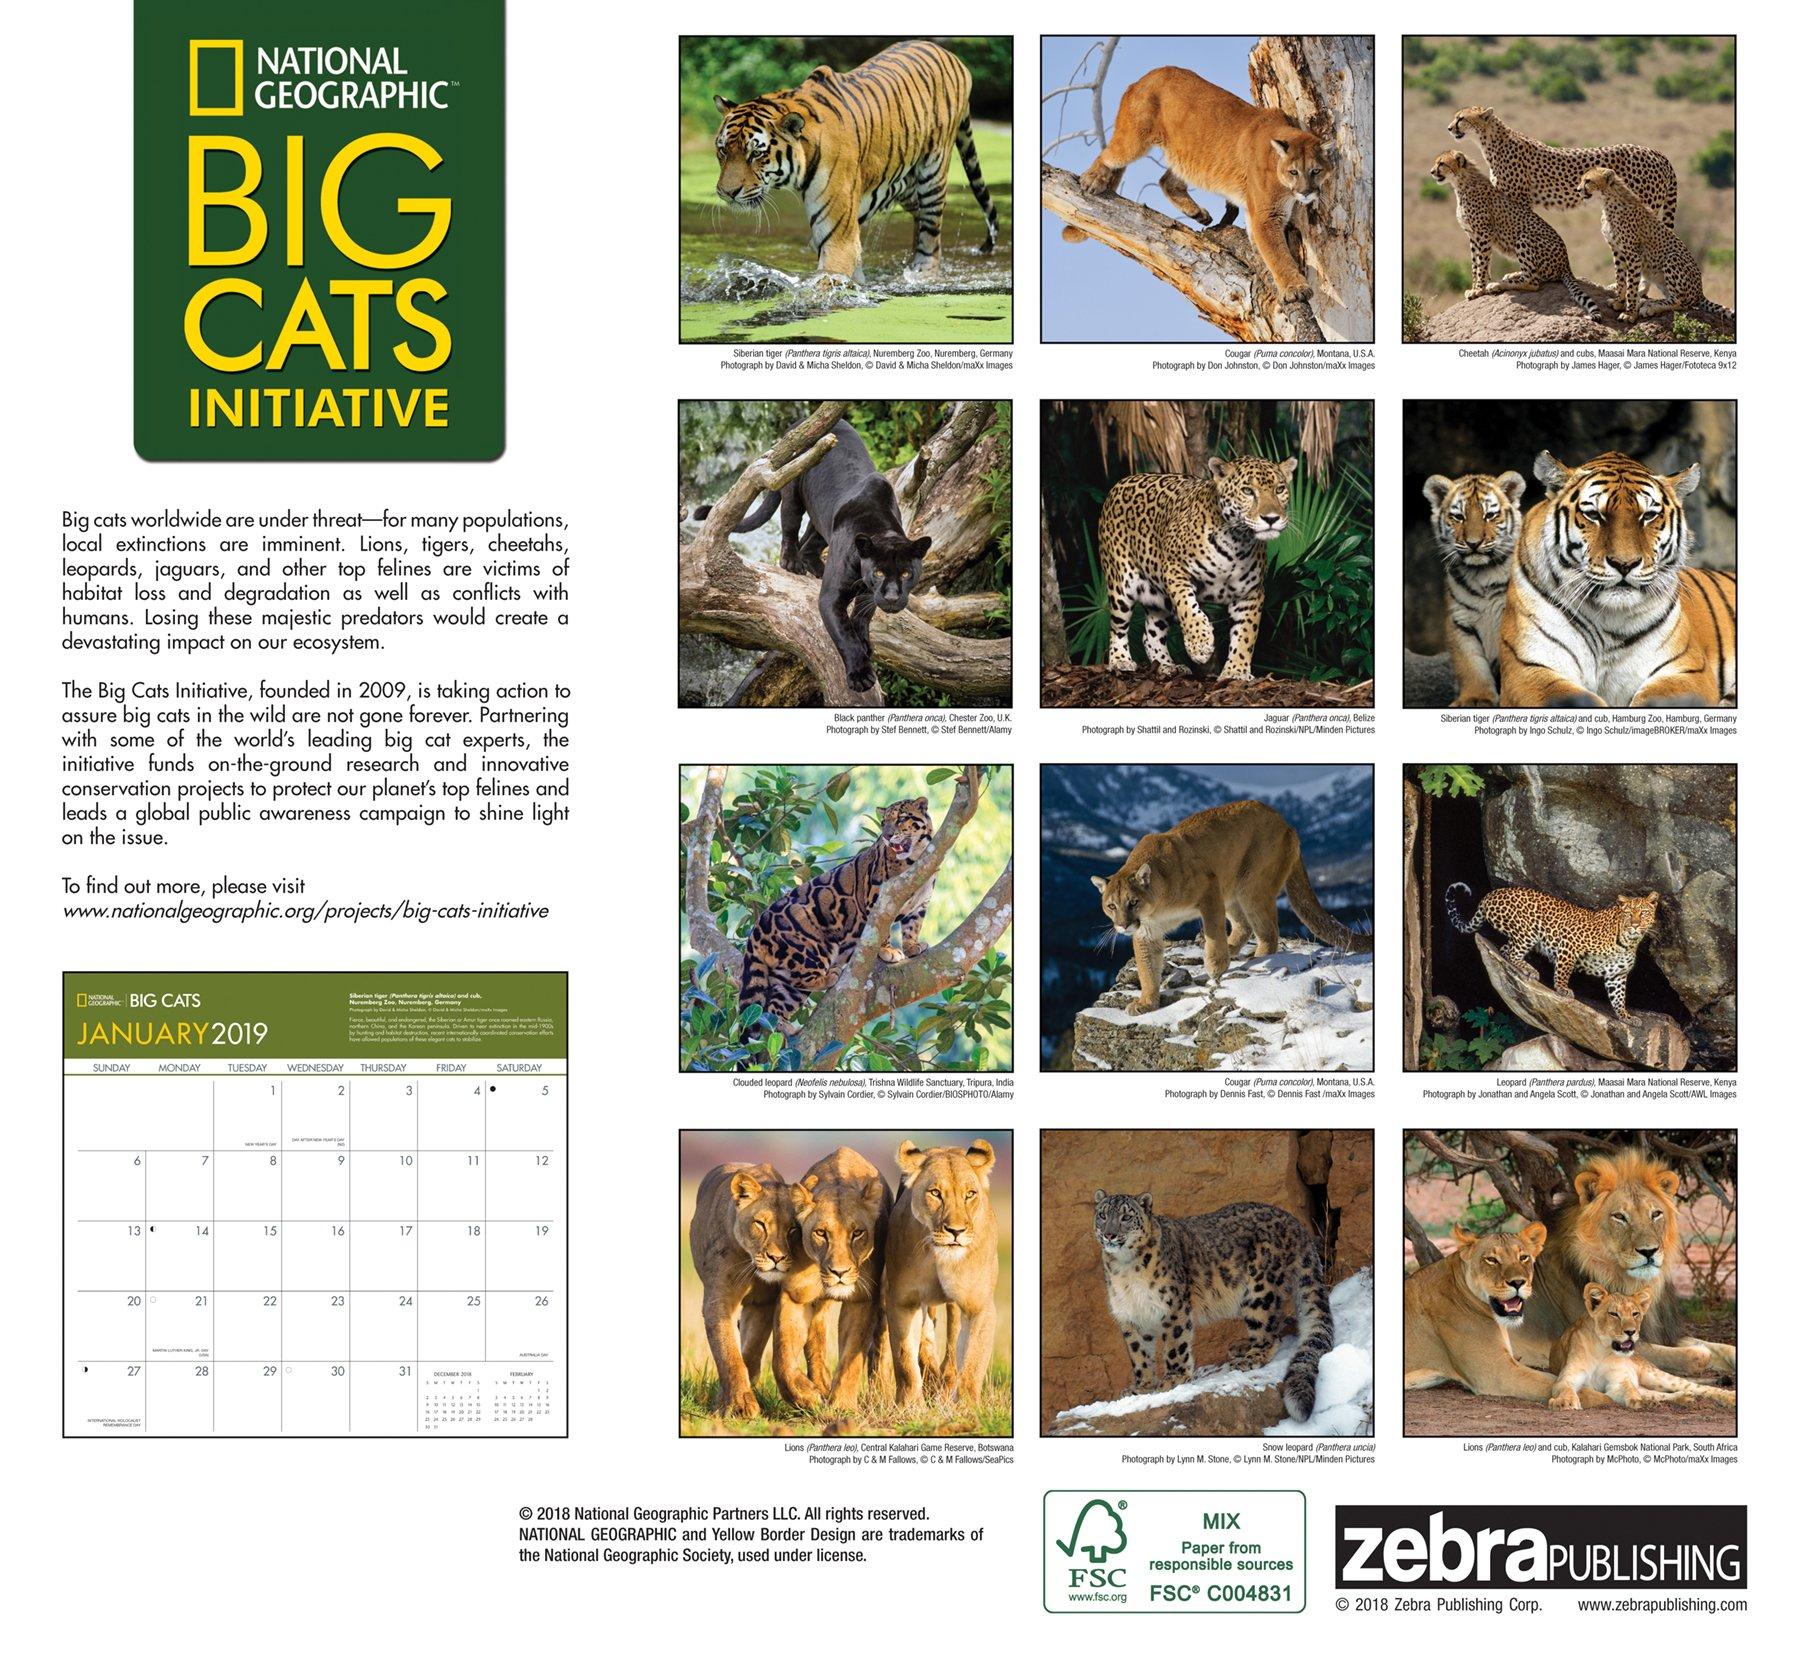 Calendario Tiger 2019.National Geographic Big Cats 2019 Wall Calendar Zebra